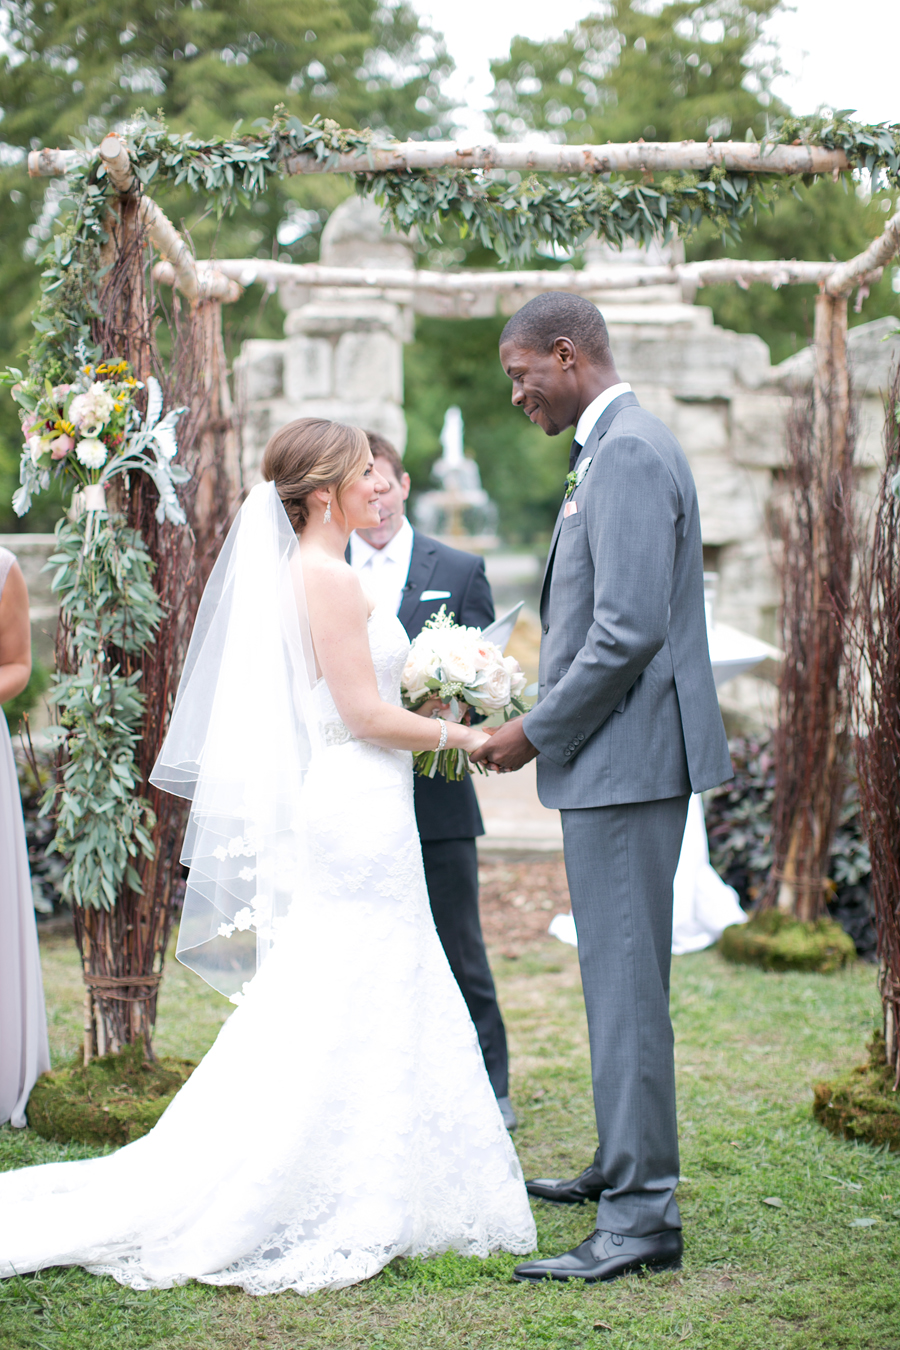 St Louis Wedding Band 3 Marvelous Nigerian Wedding Attire St